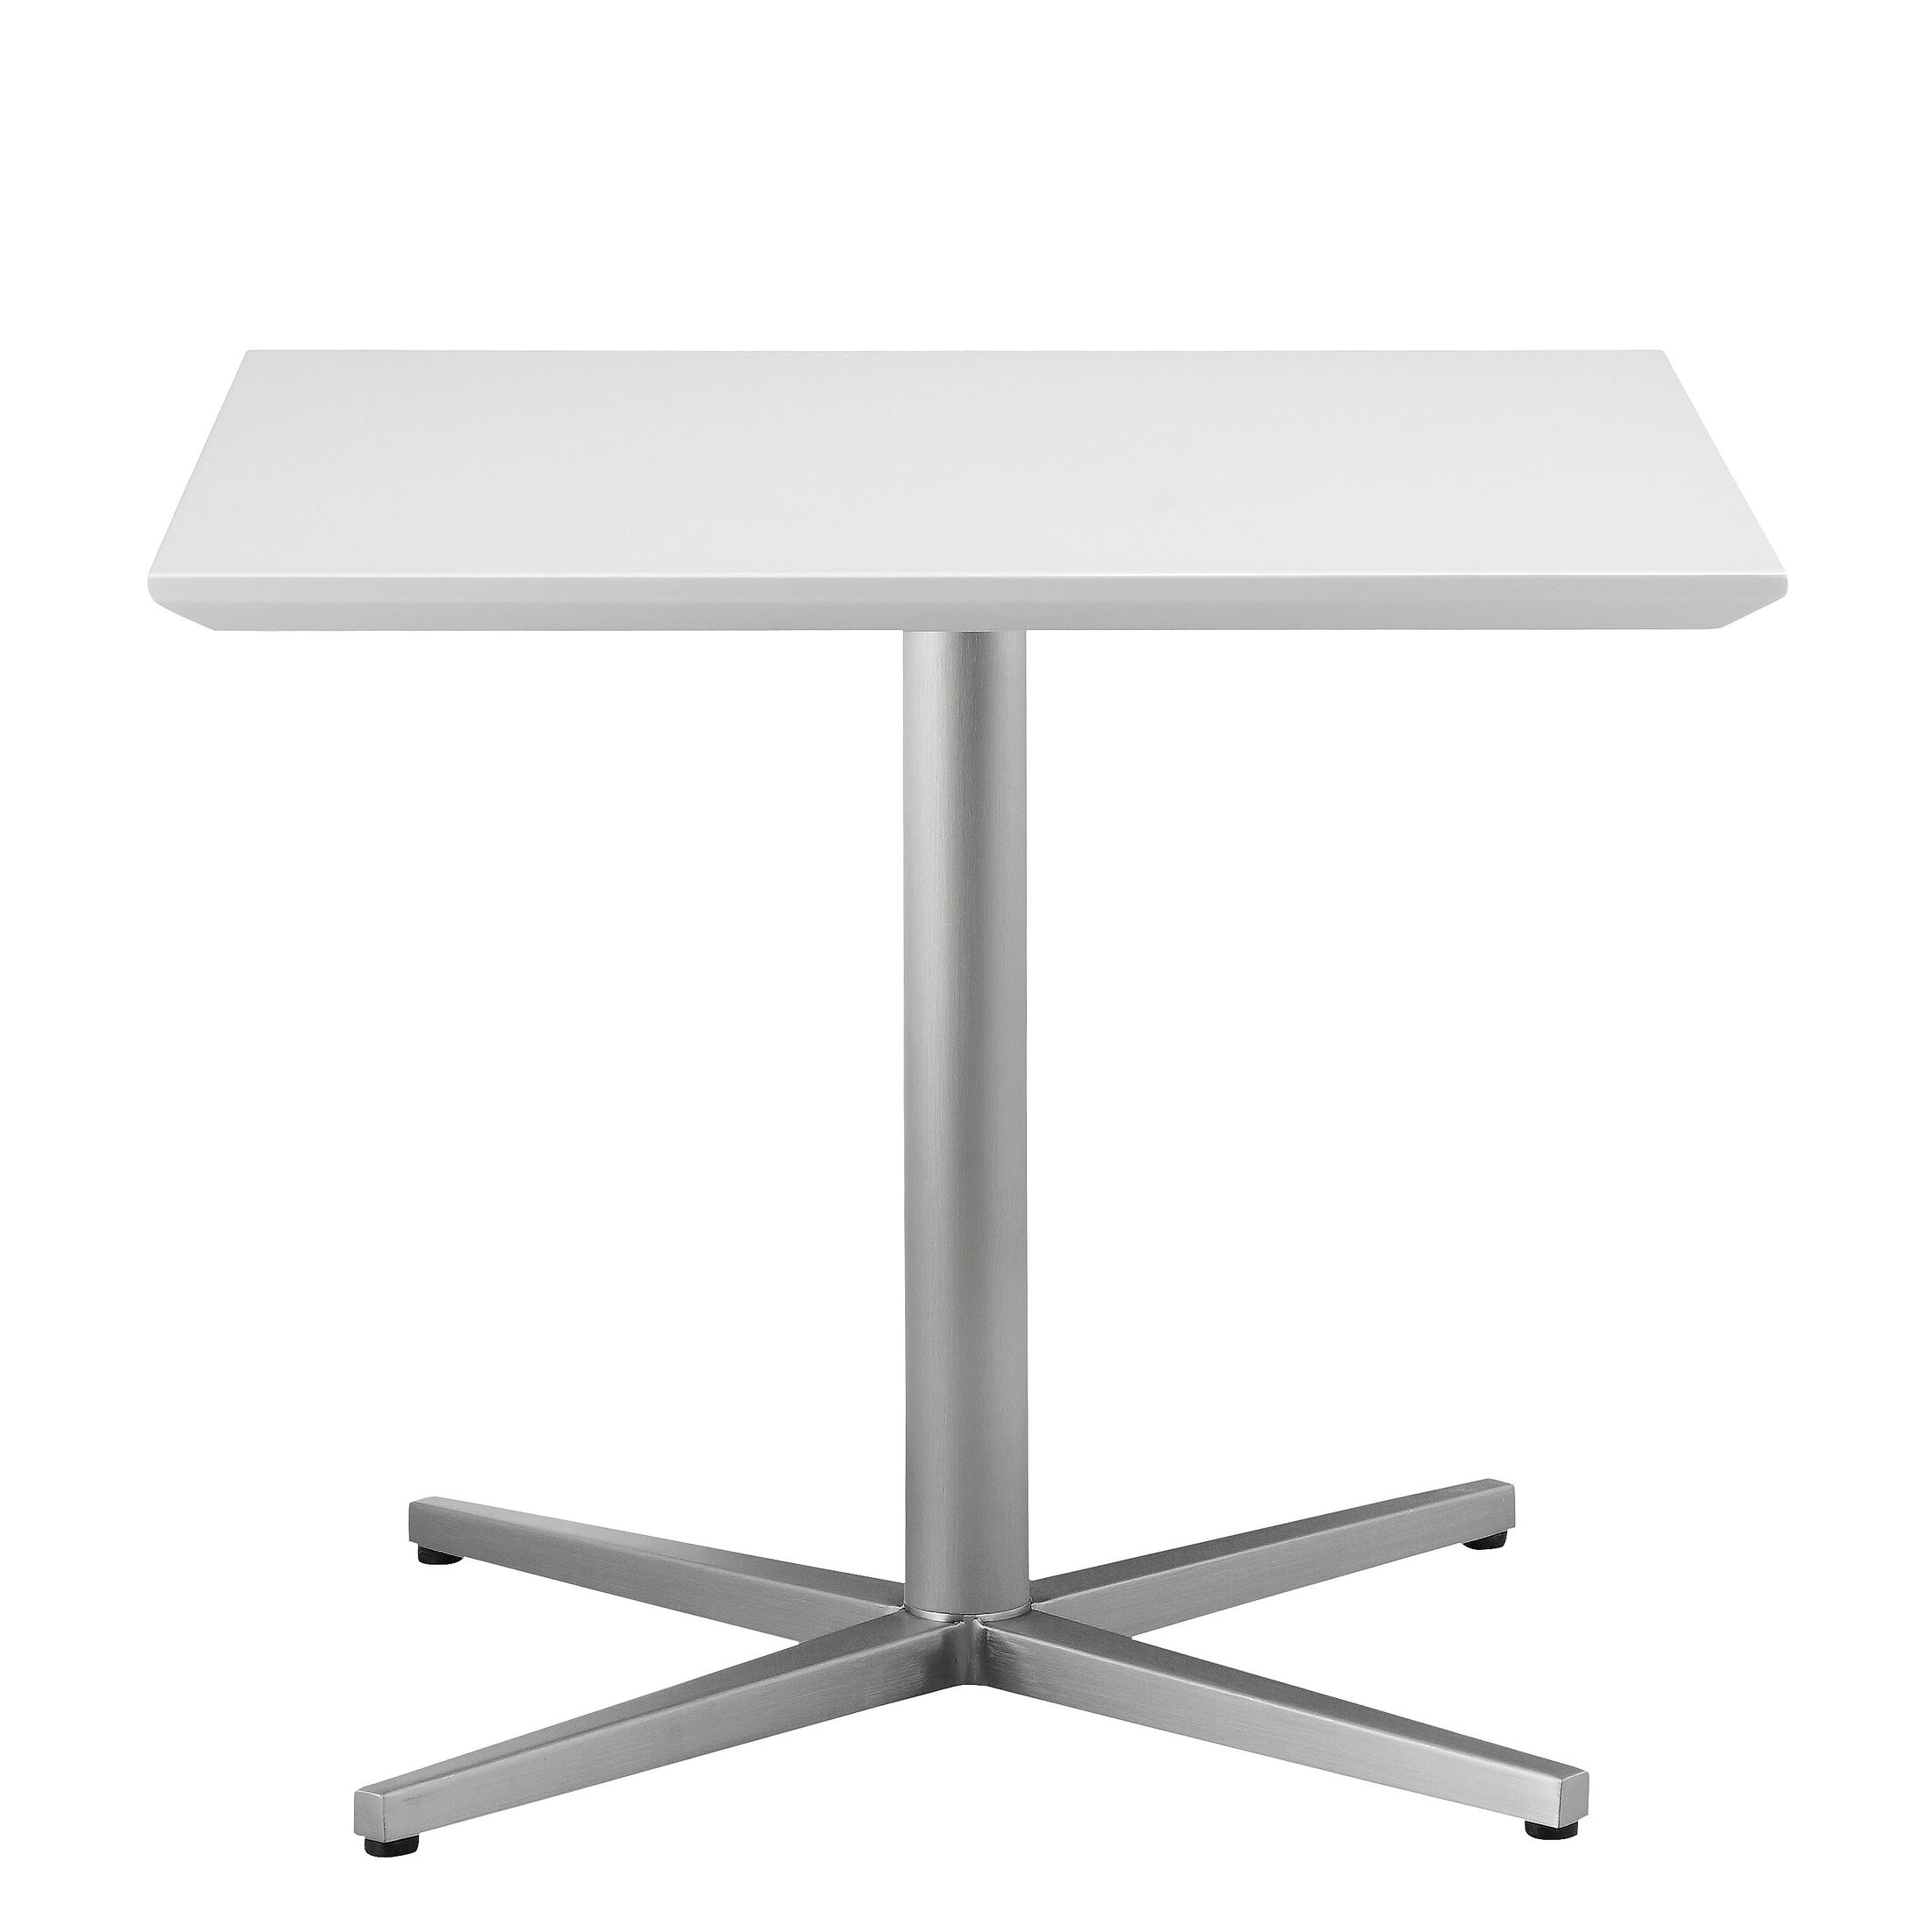 Glidden End Table Color: White